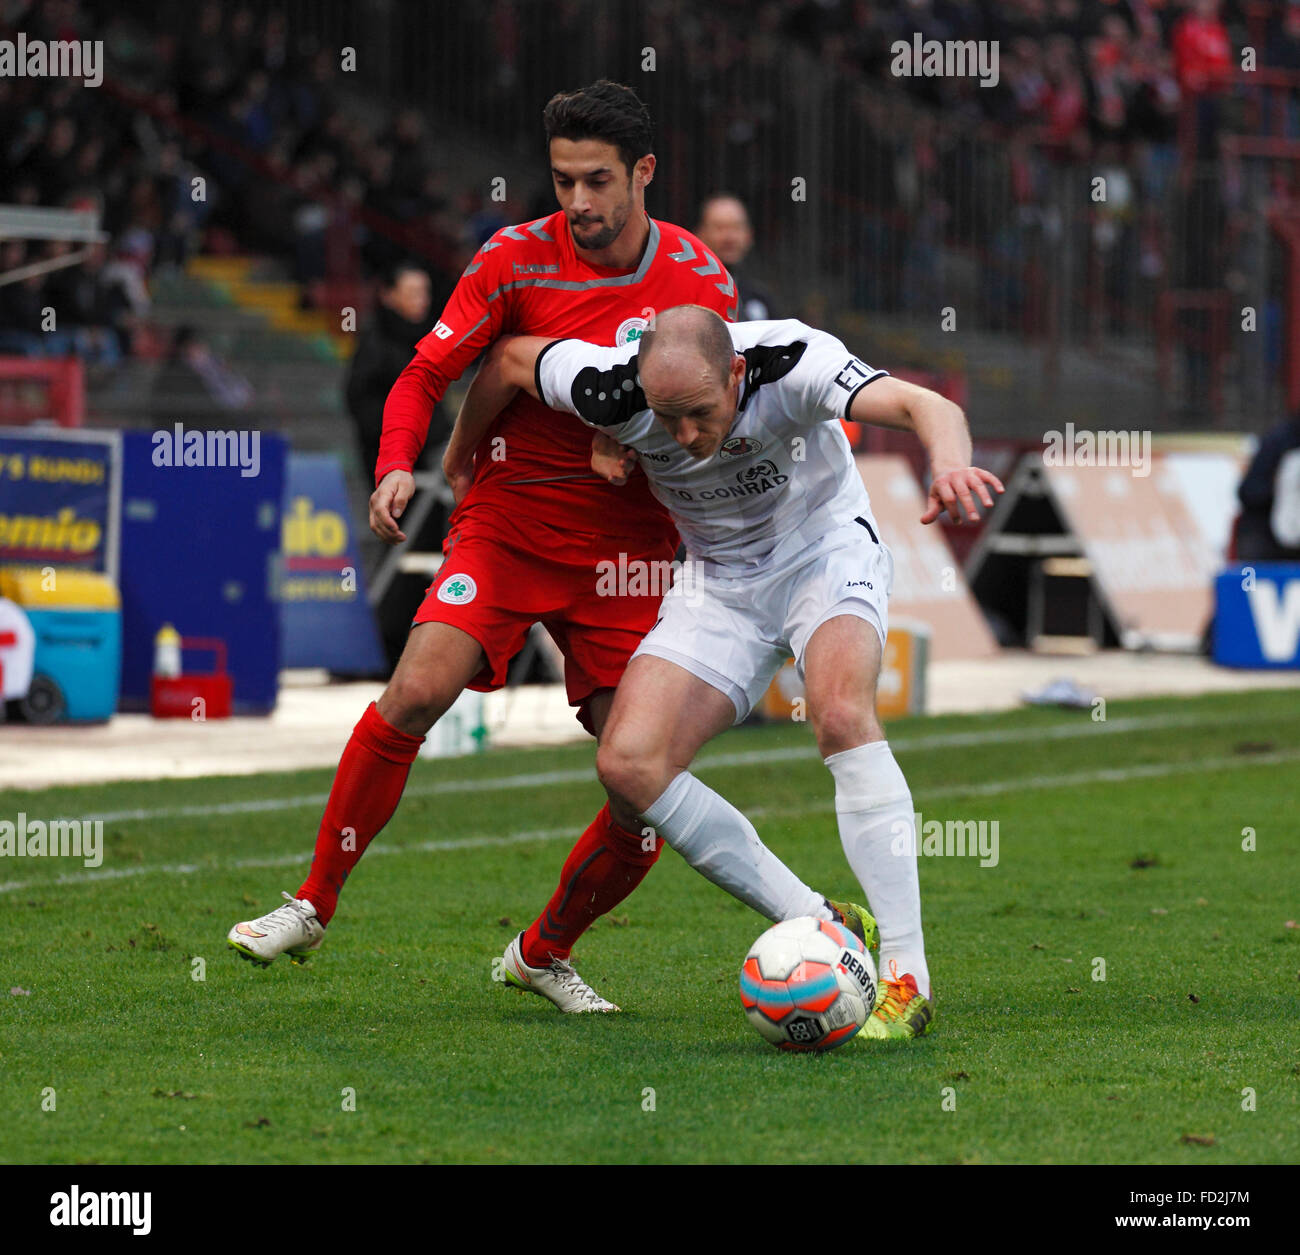 sports, football, Regional League West, 2015/2016, Rot Weiss Oberhausen versus FC Viktoria Koeln 1904 0:3, Stadium - Stock Image